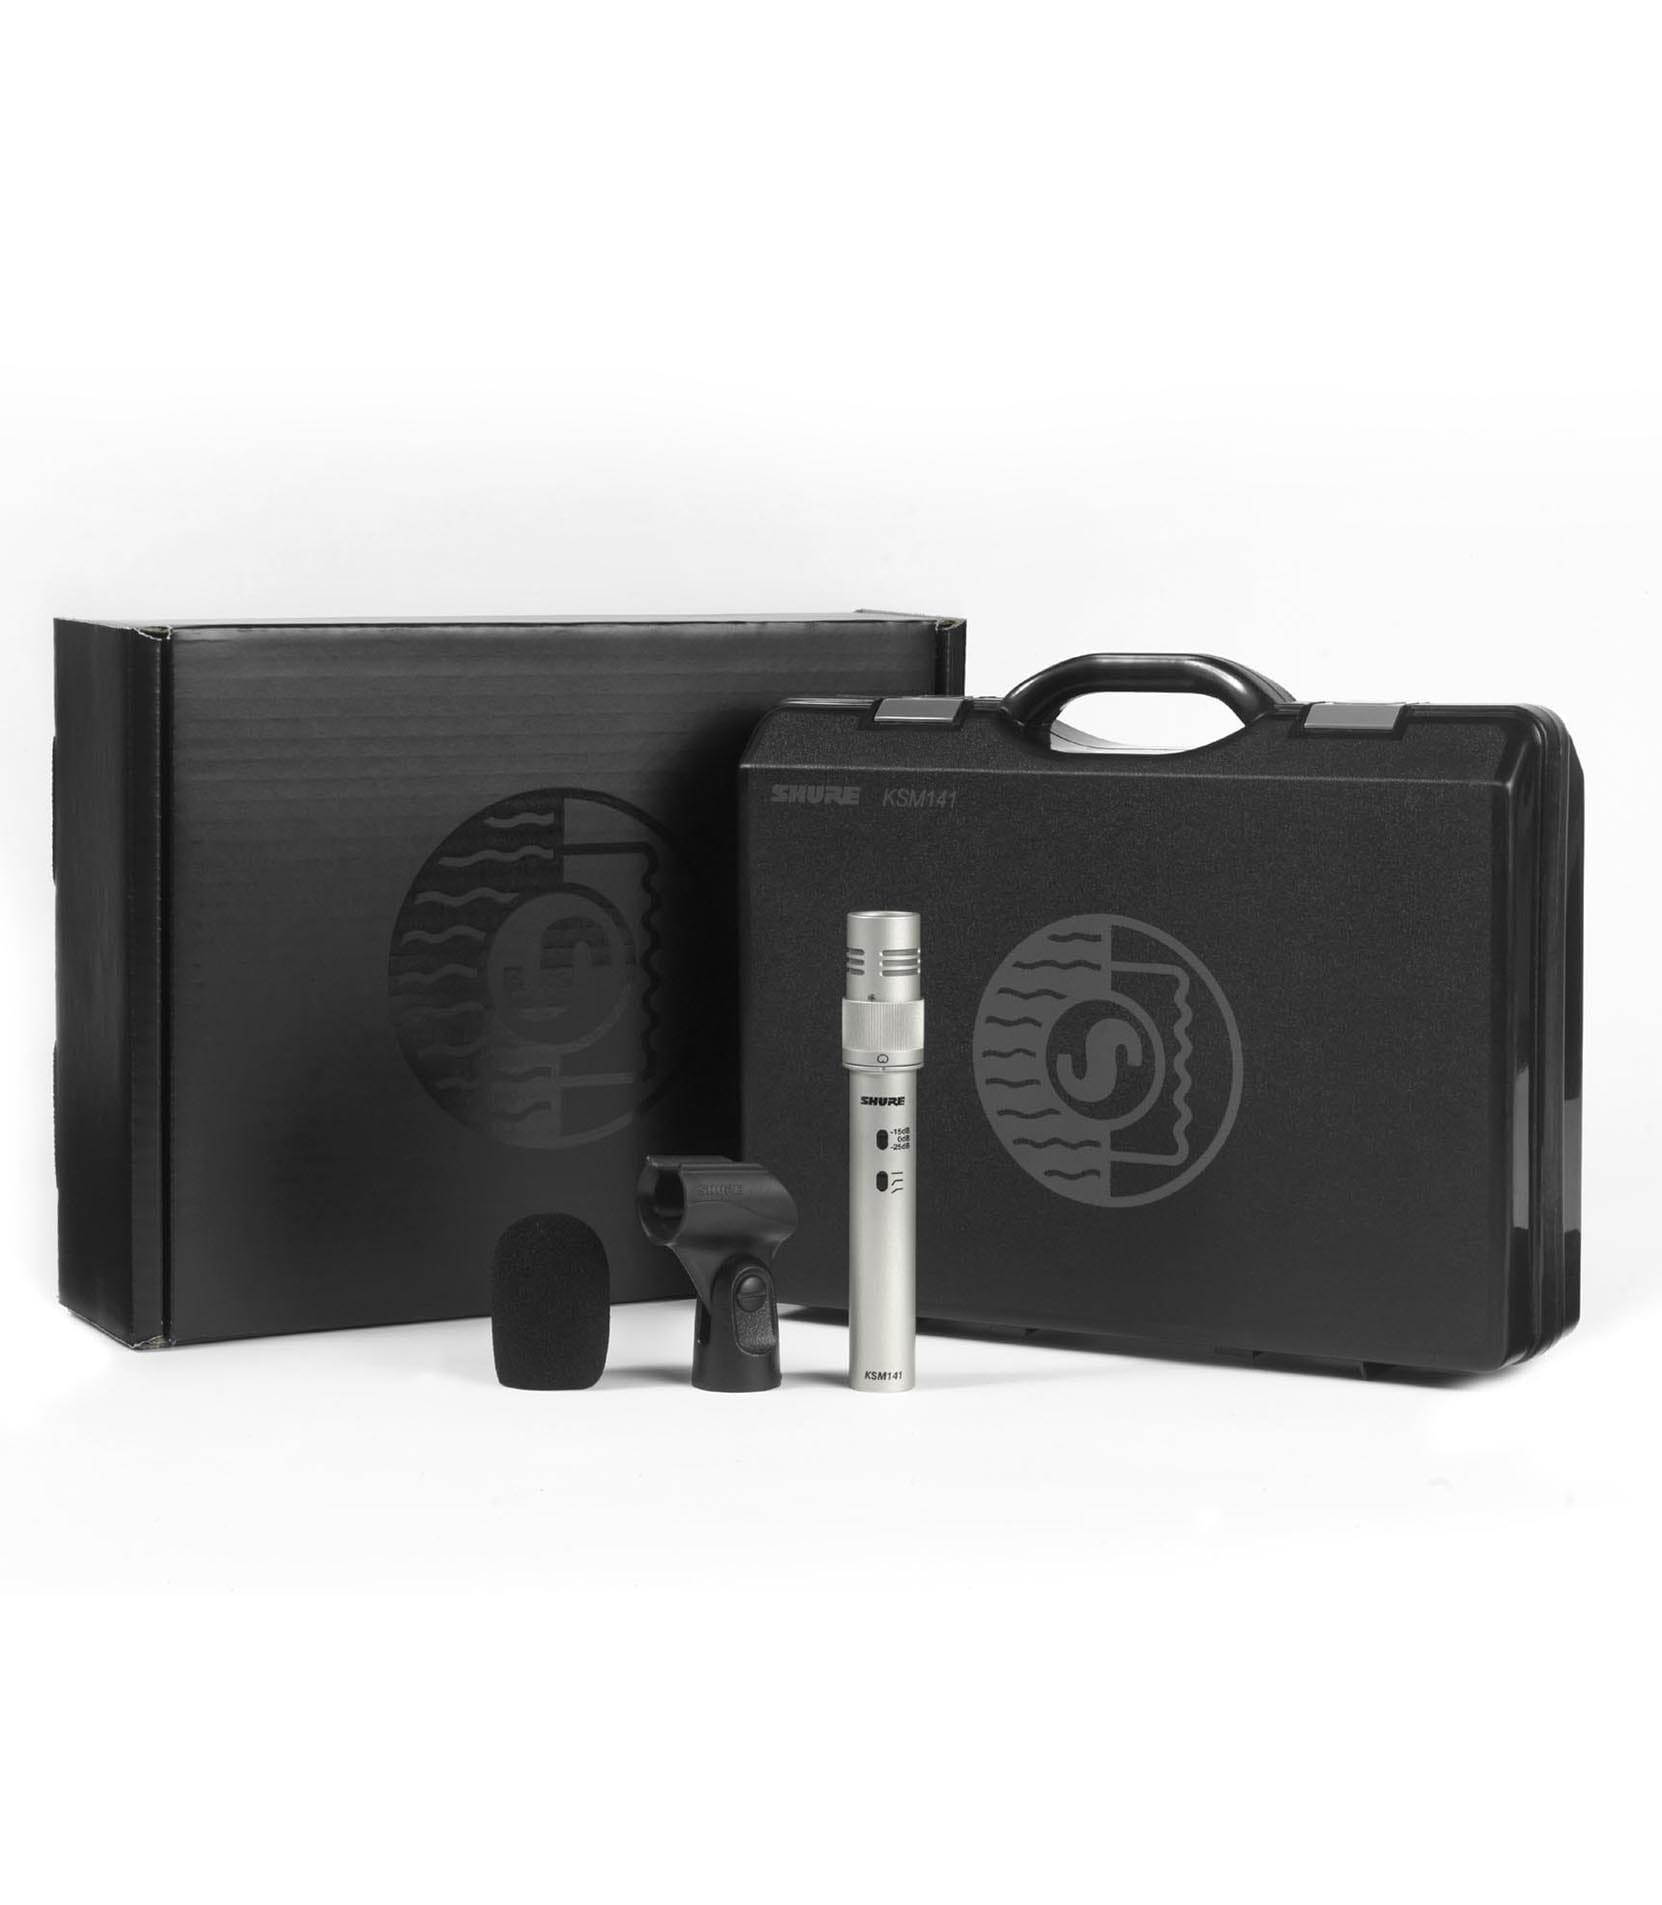 KSM141 SL Condenser Microphone - Buy Online